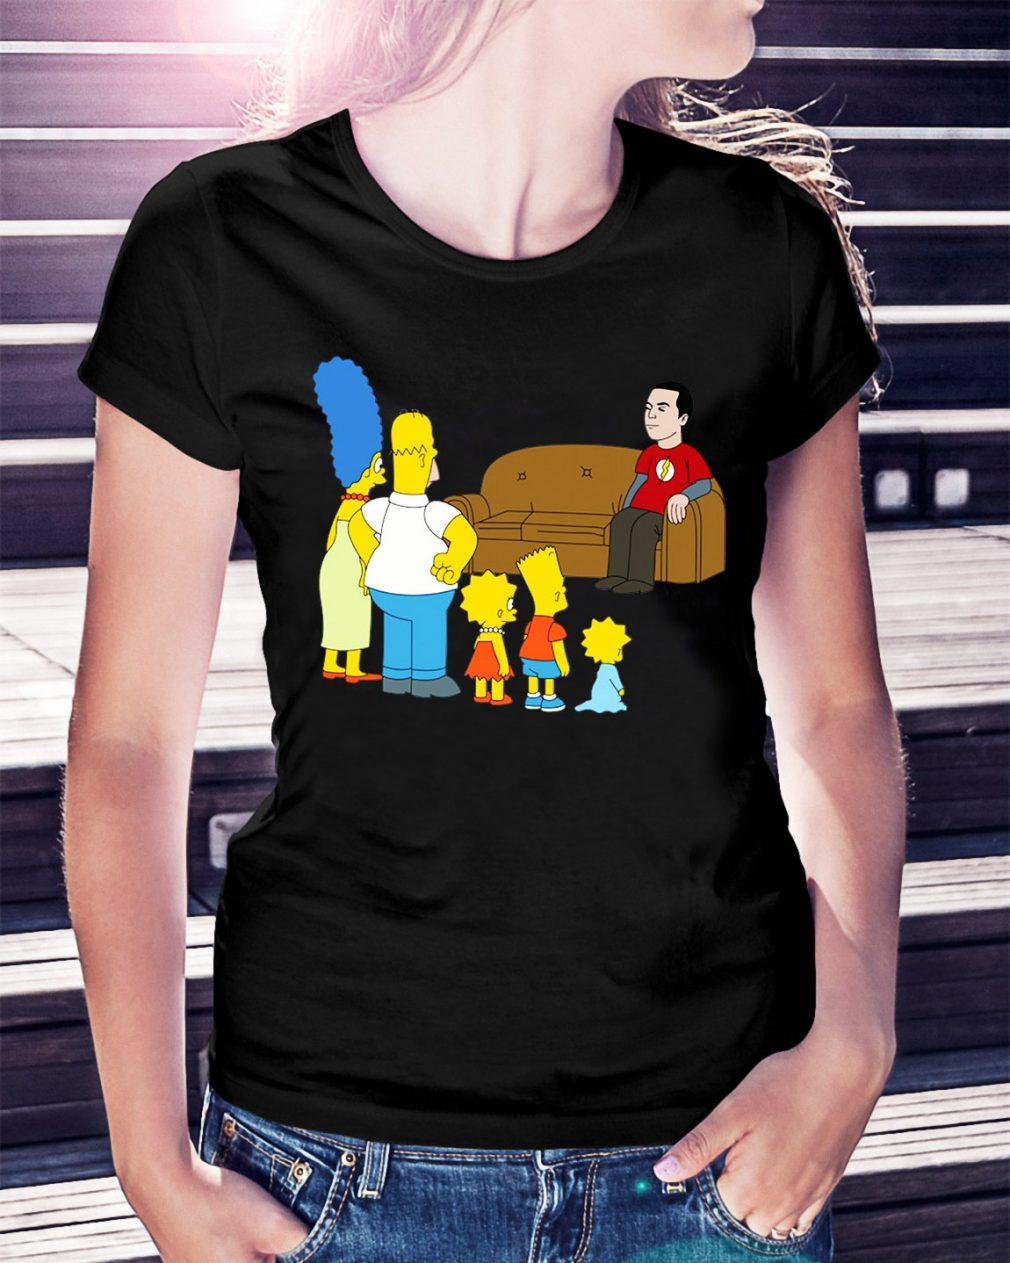 The Simpsons Sheldon Cooper - Bazinga Ladies Tee